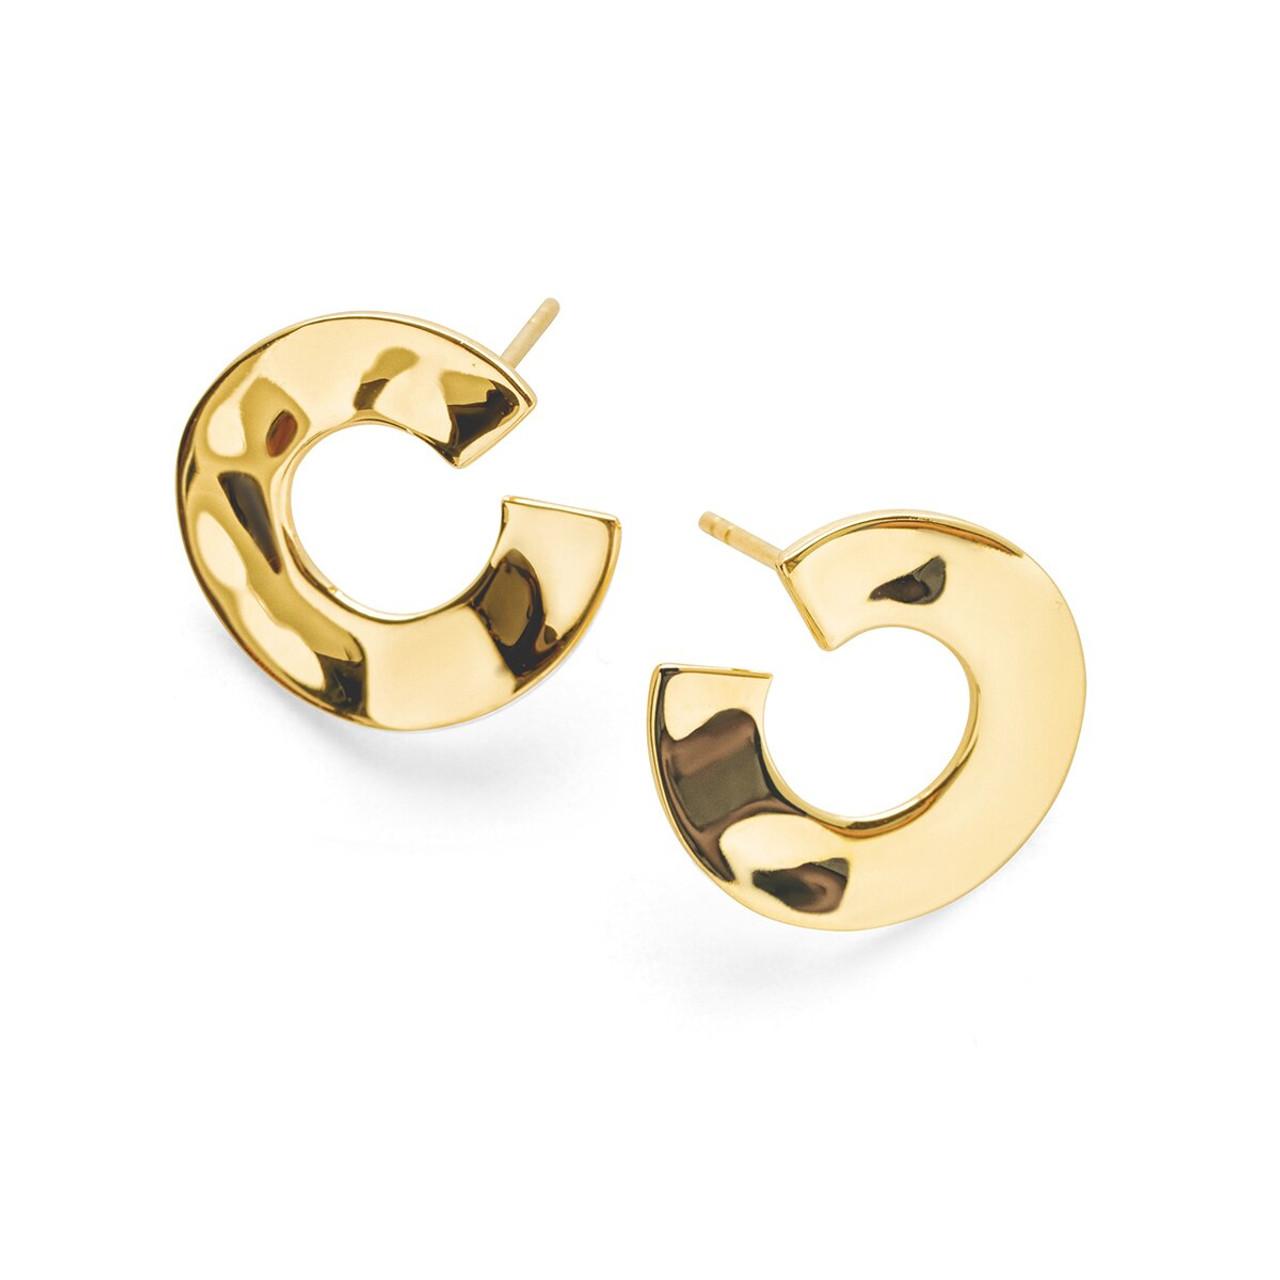 Details about  /18K Gold Filled Stunning Italian Petite Diamond 18ct GF Earrings 20mm